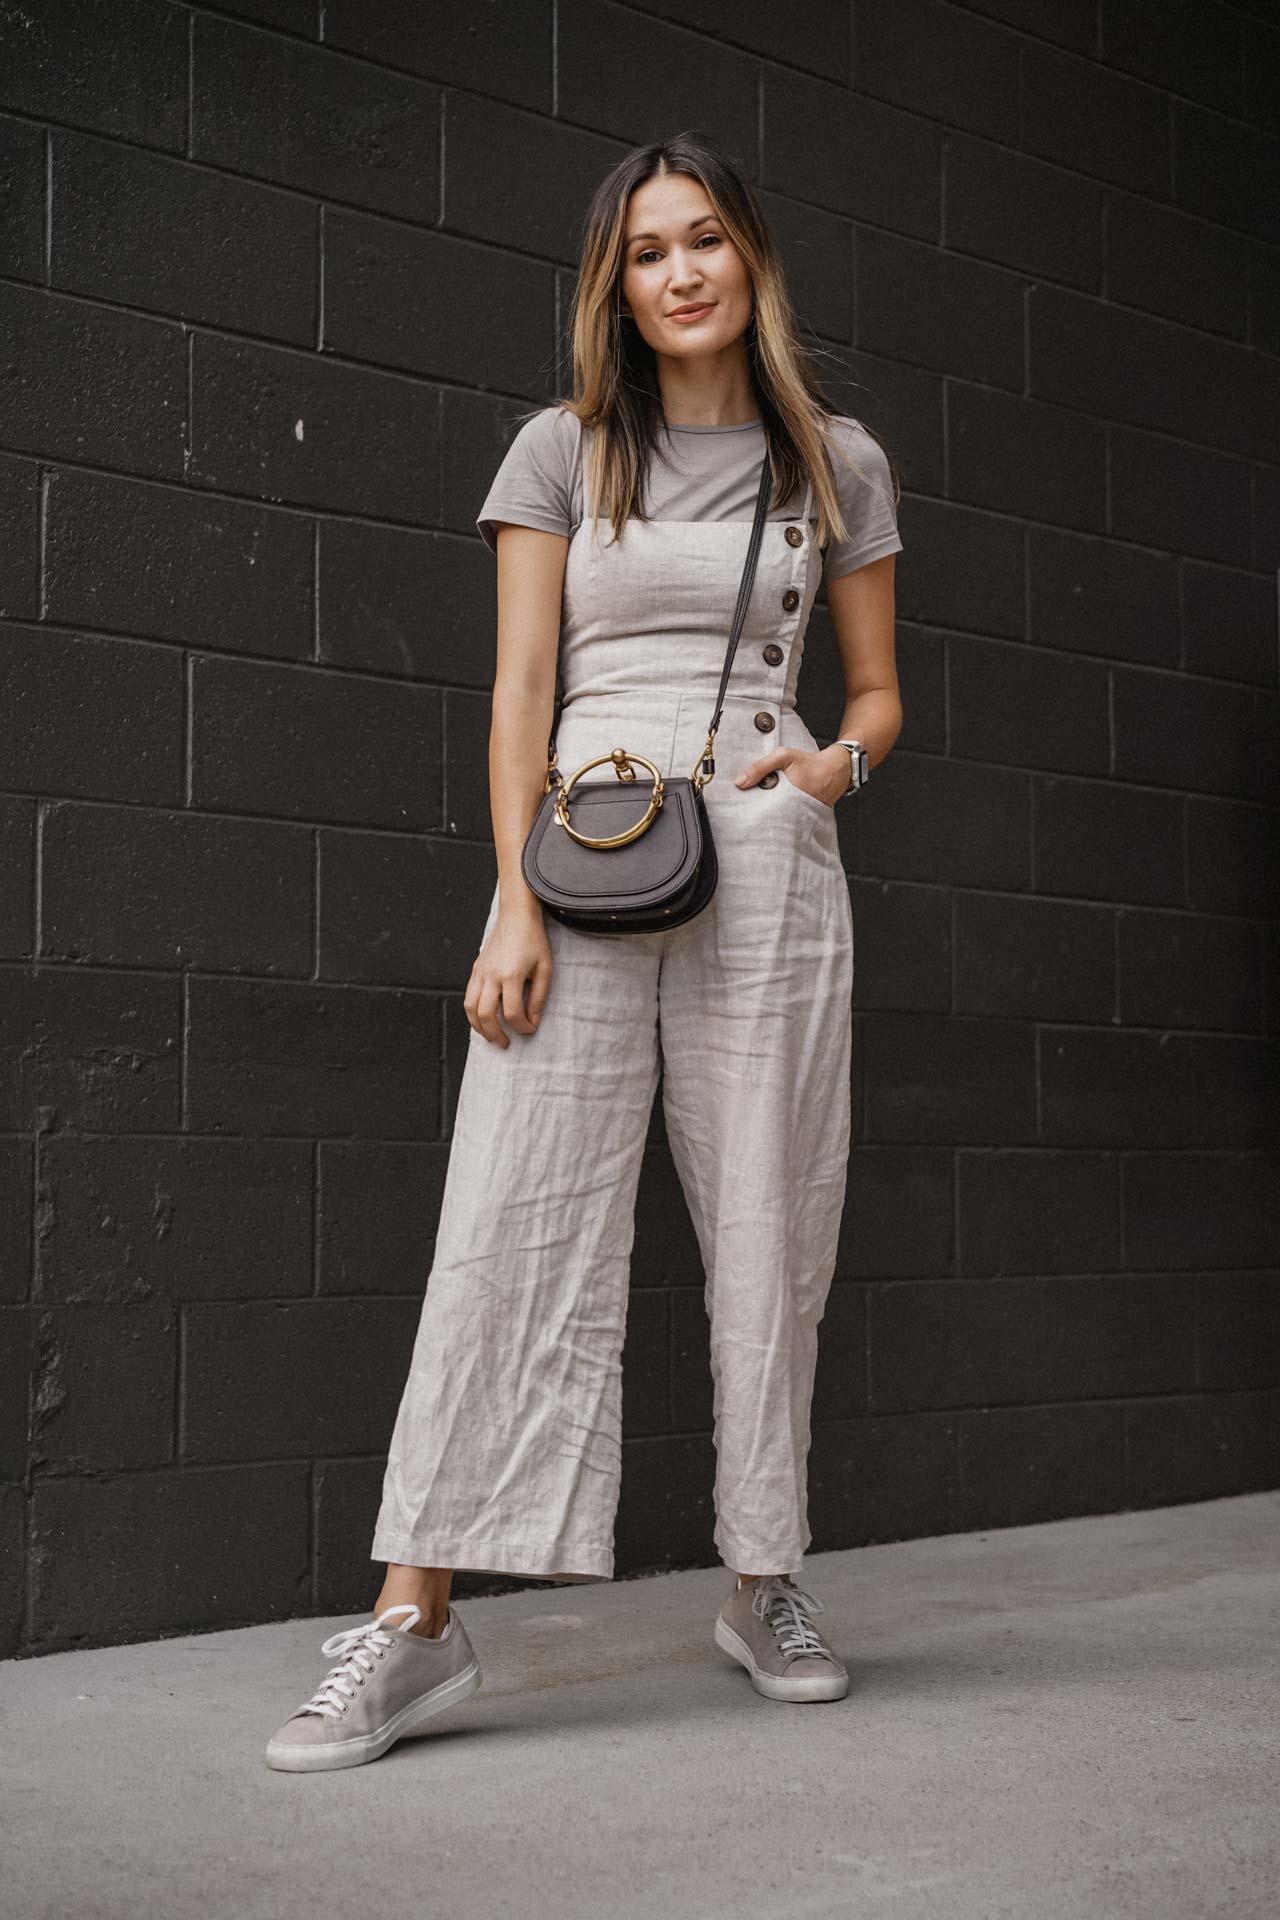 top   J Brand     jumpsuit  Reformation    bag   Chloe     sneakers   Diemme    (all old, similar items linked)